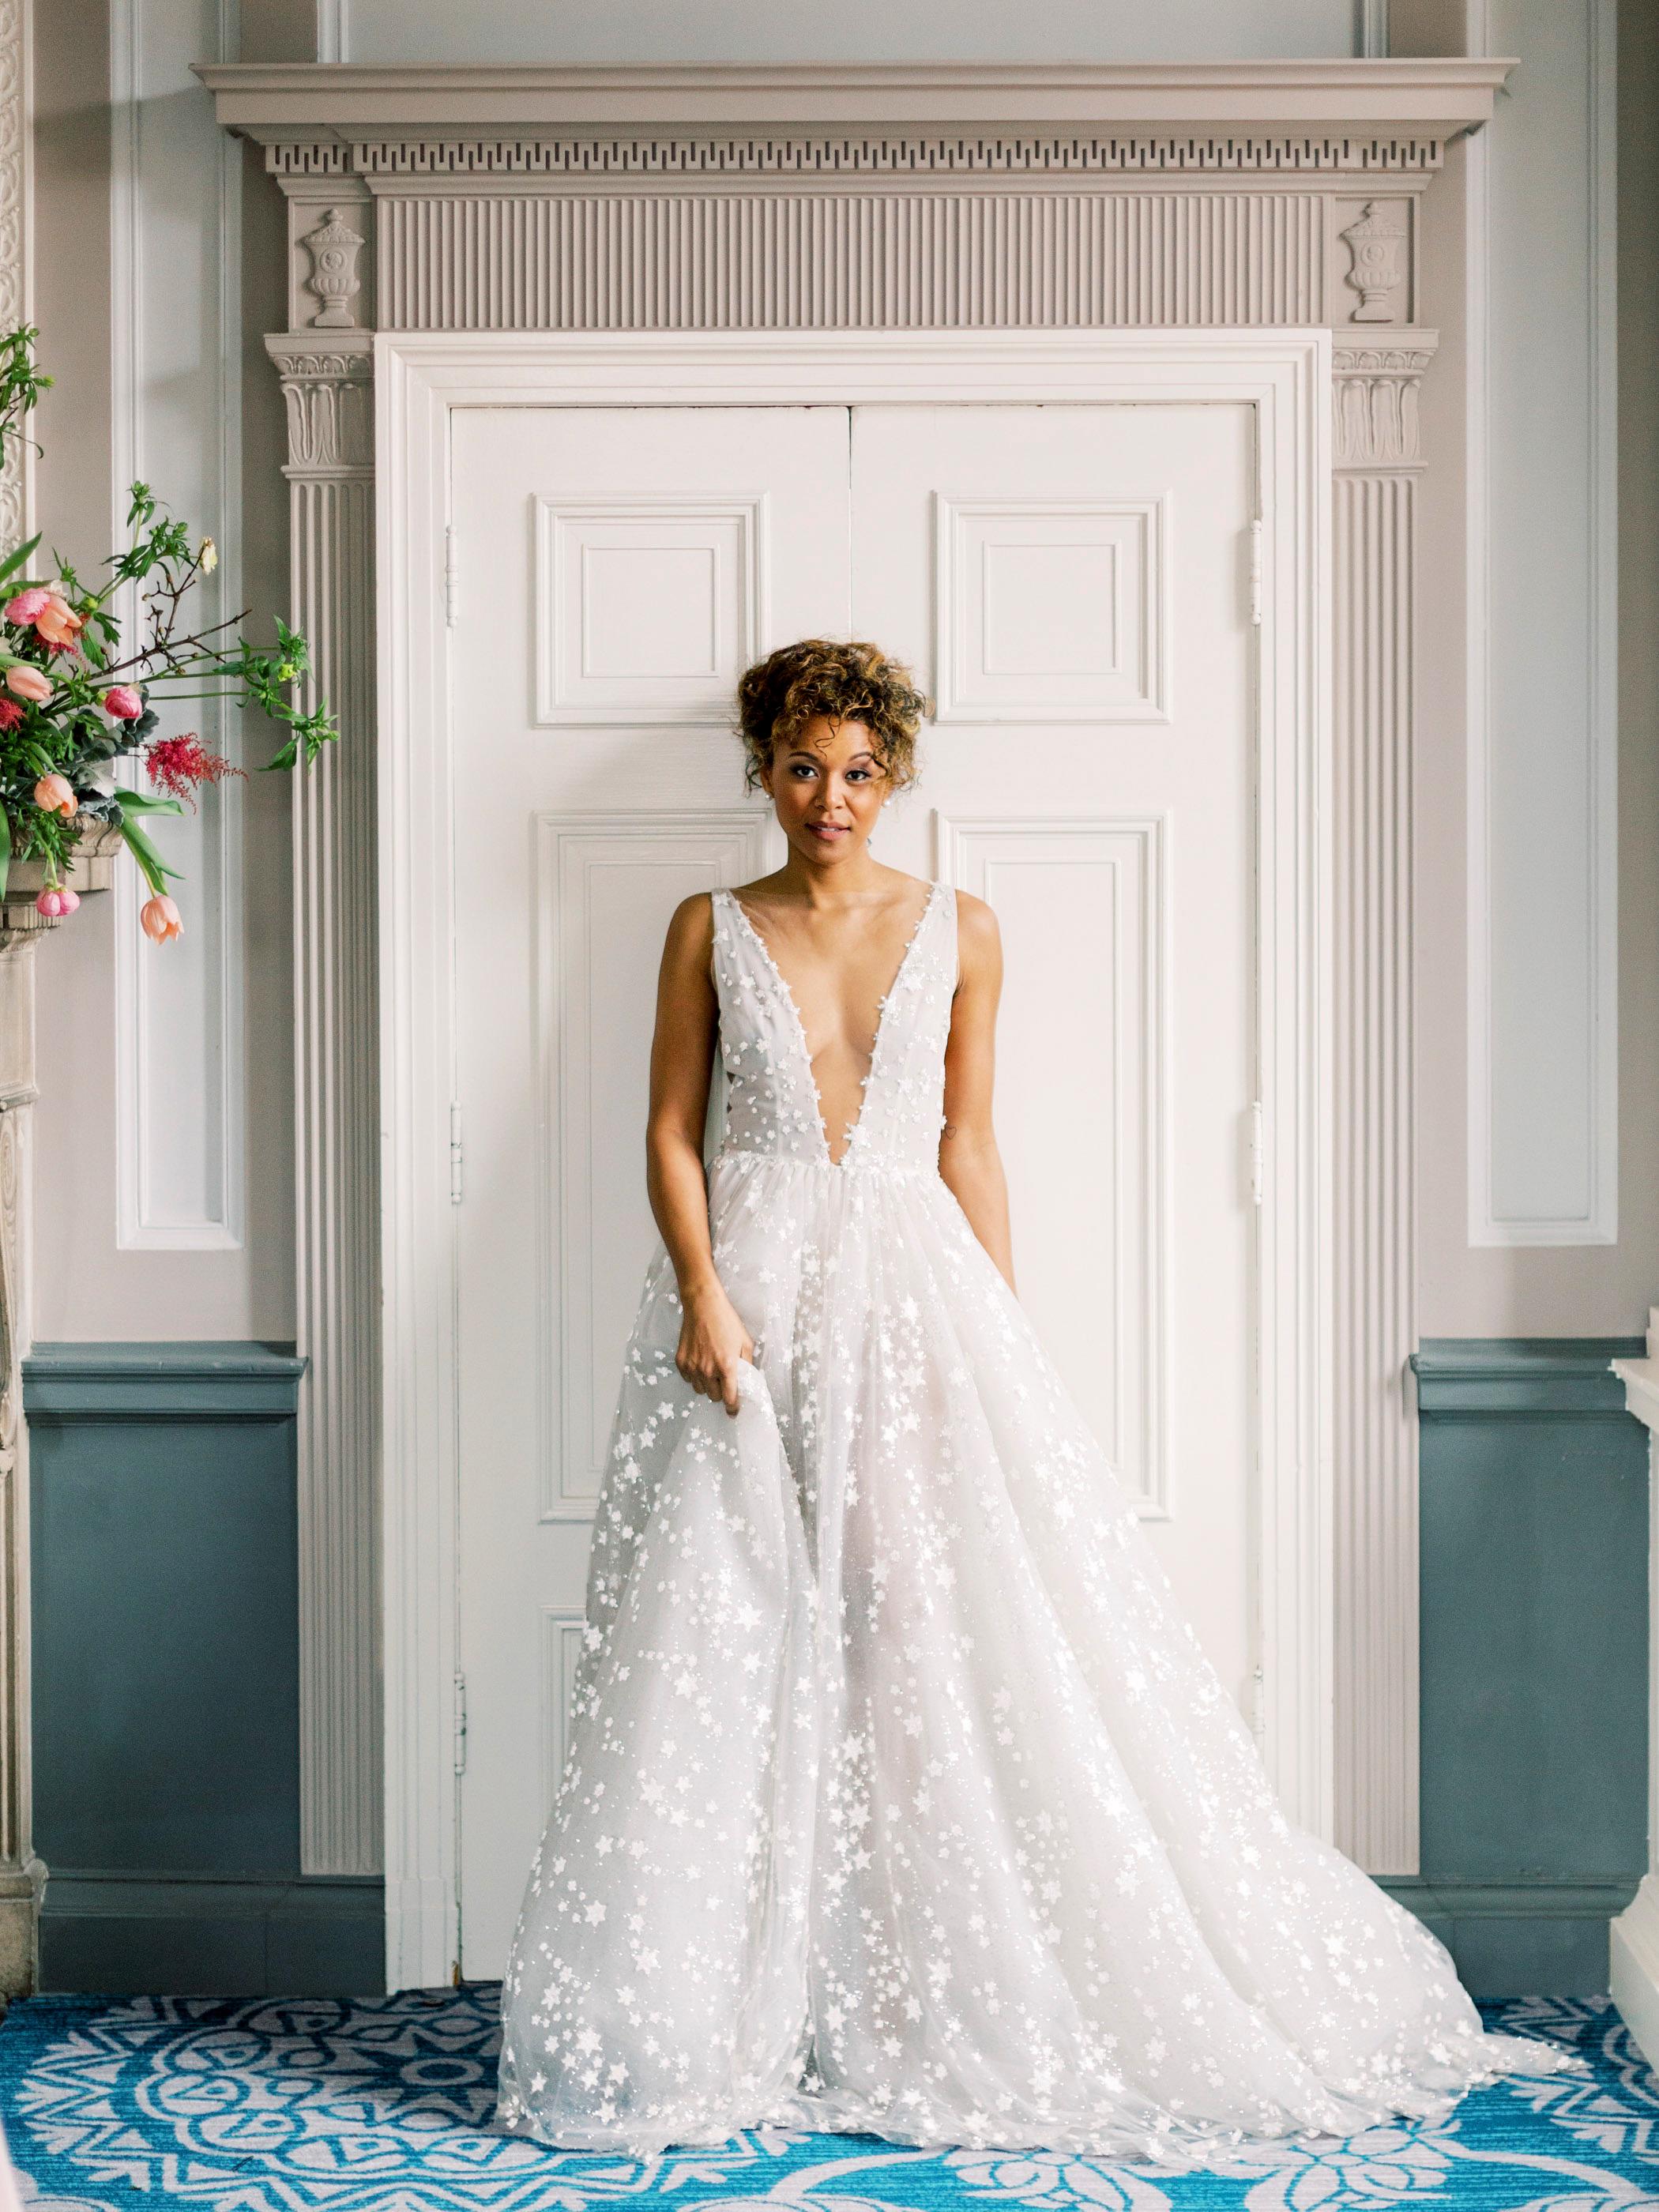 Starry Night Wedding Kleid Real 28fb8 97ecb,Sepedi Traditional Wedding Dresses For Bridesmaids